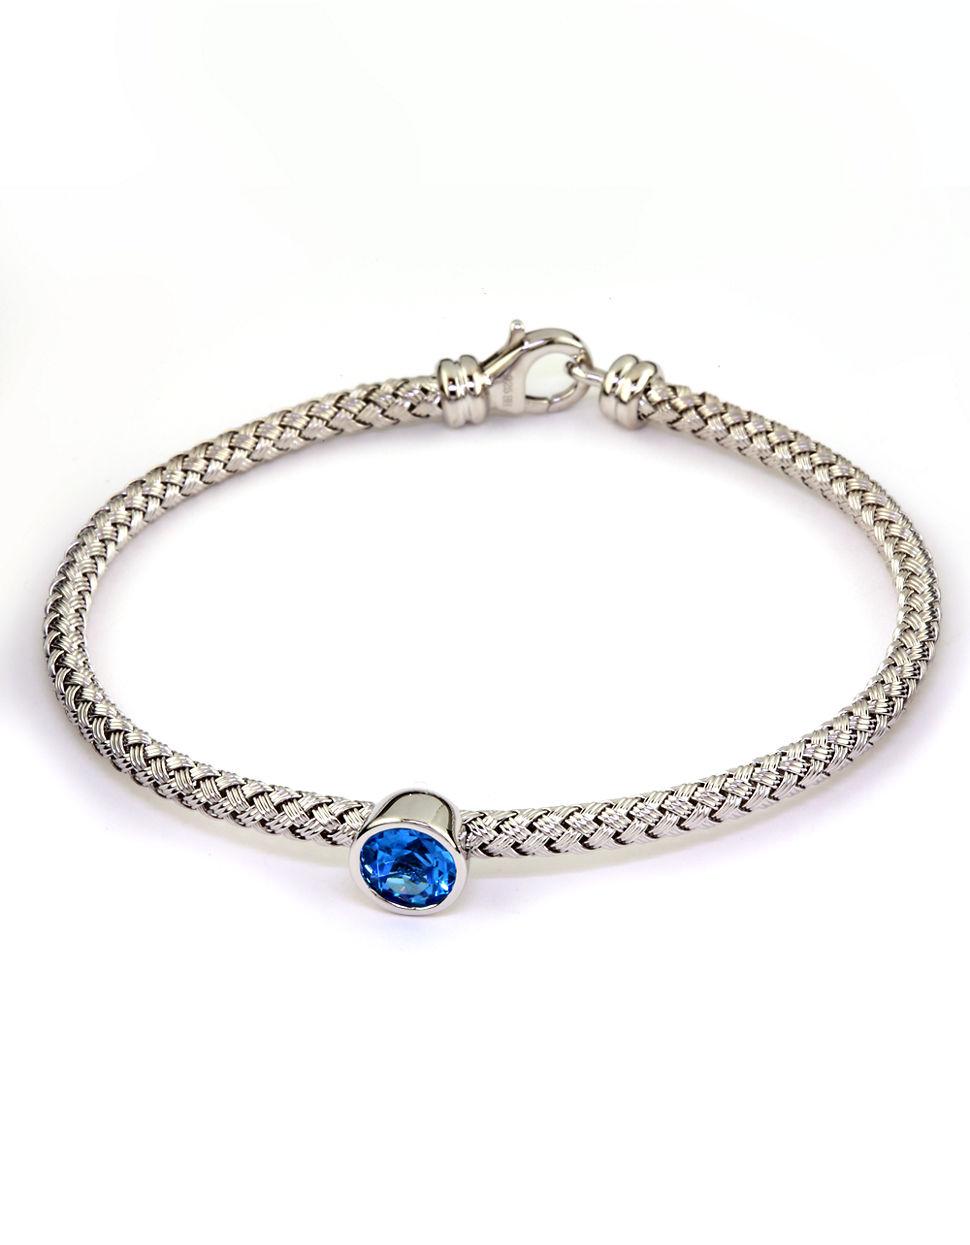 Effy Balissima Sterling Silver Blue Topaz Tennis Bracelet